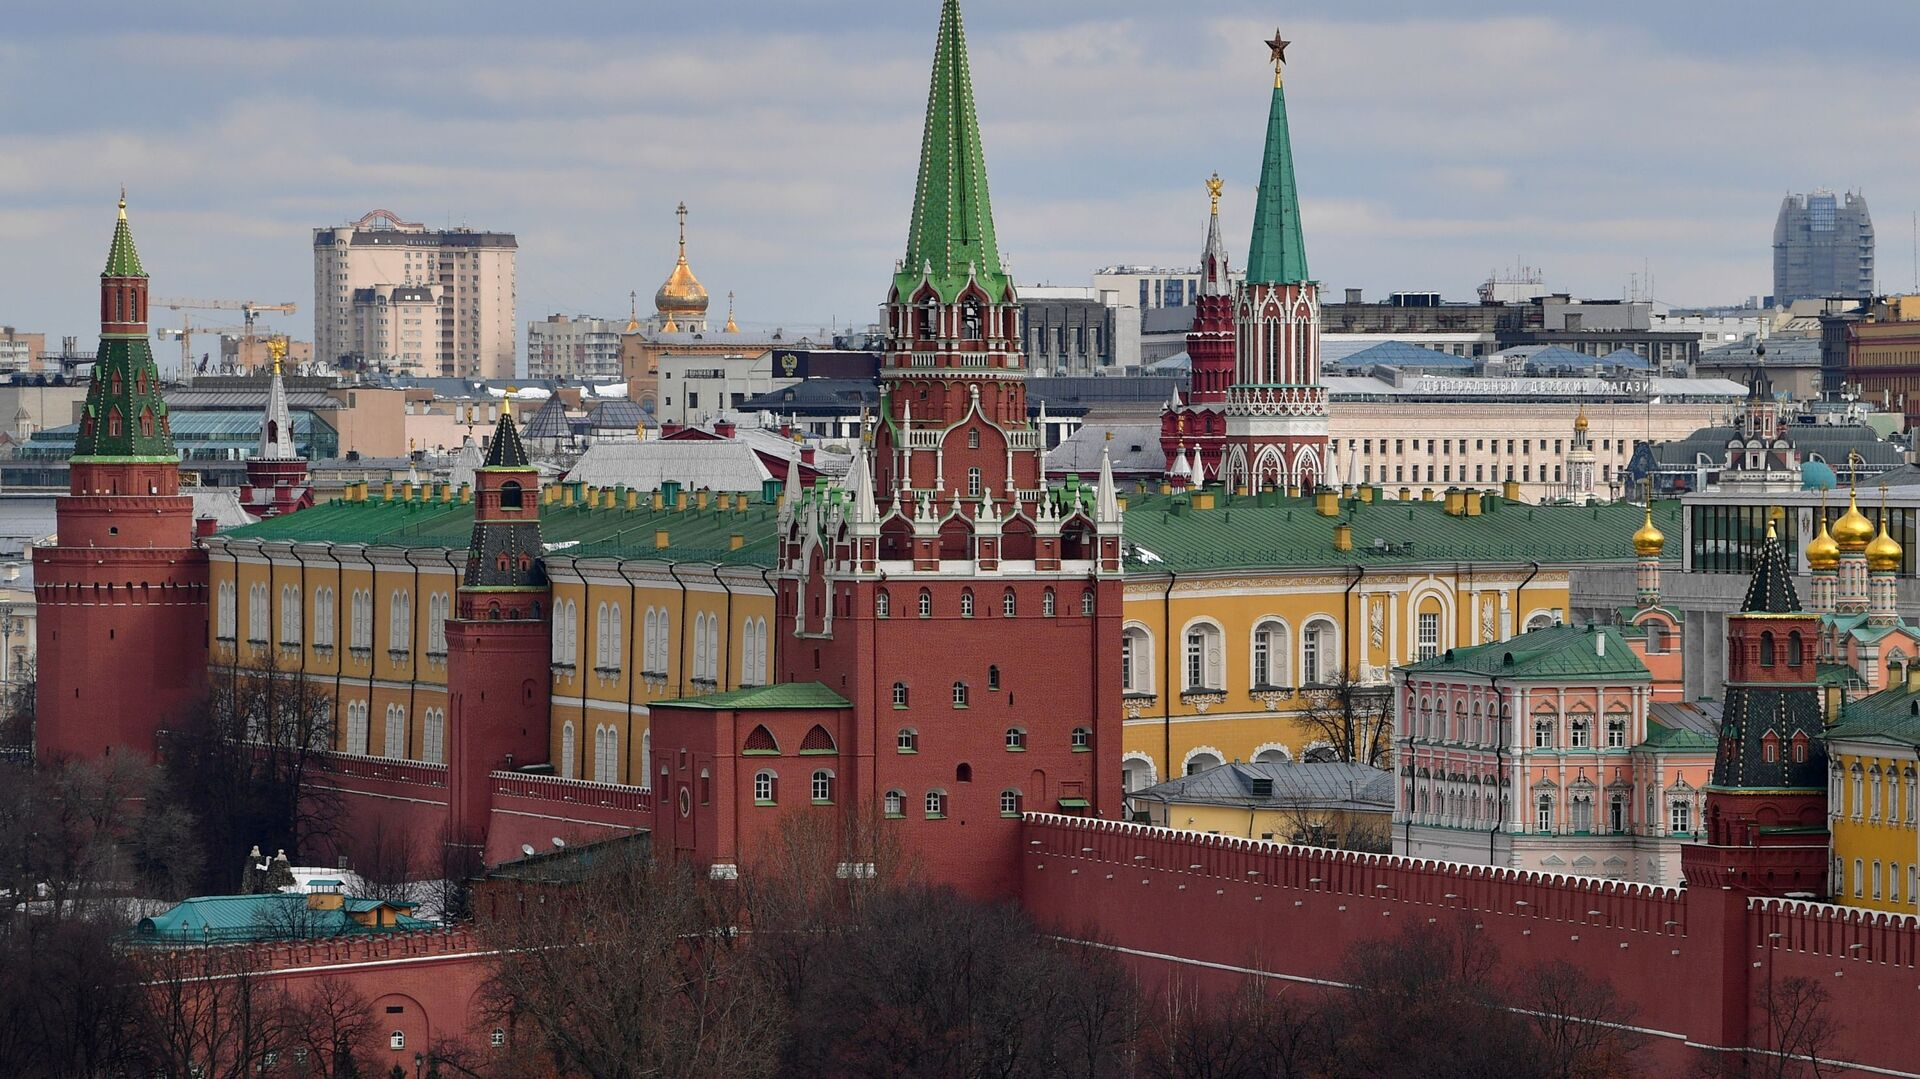 Поглед на московски Кремљ - Sputnik Србија, 1920, 08.07.2021